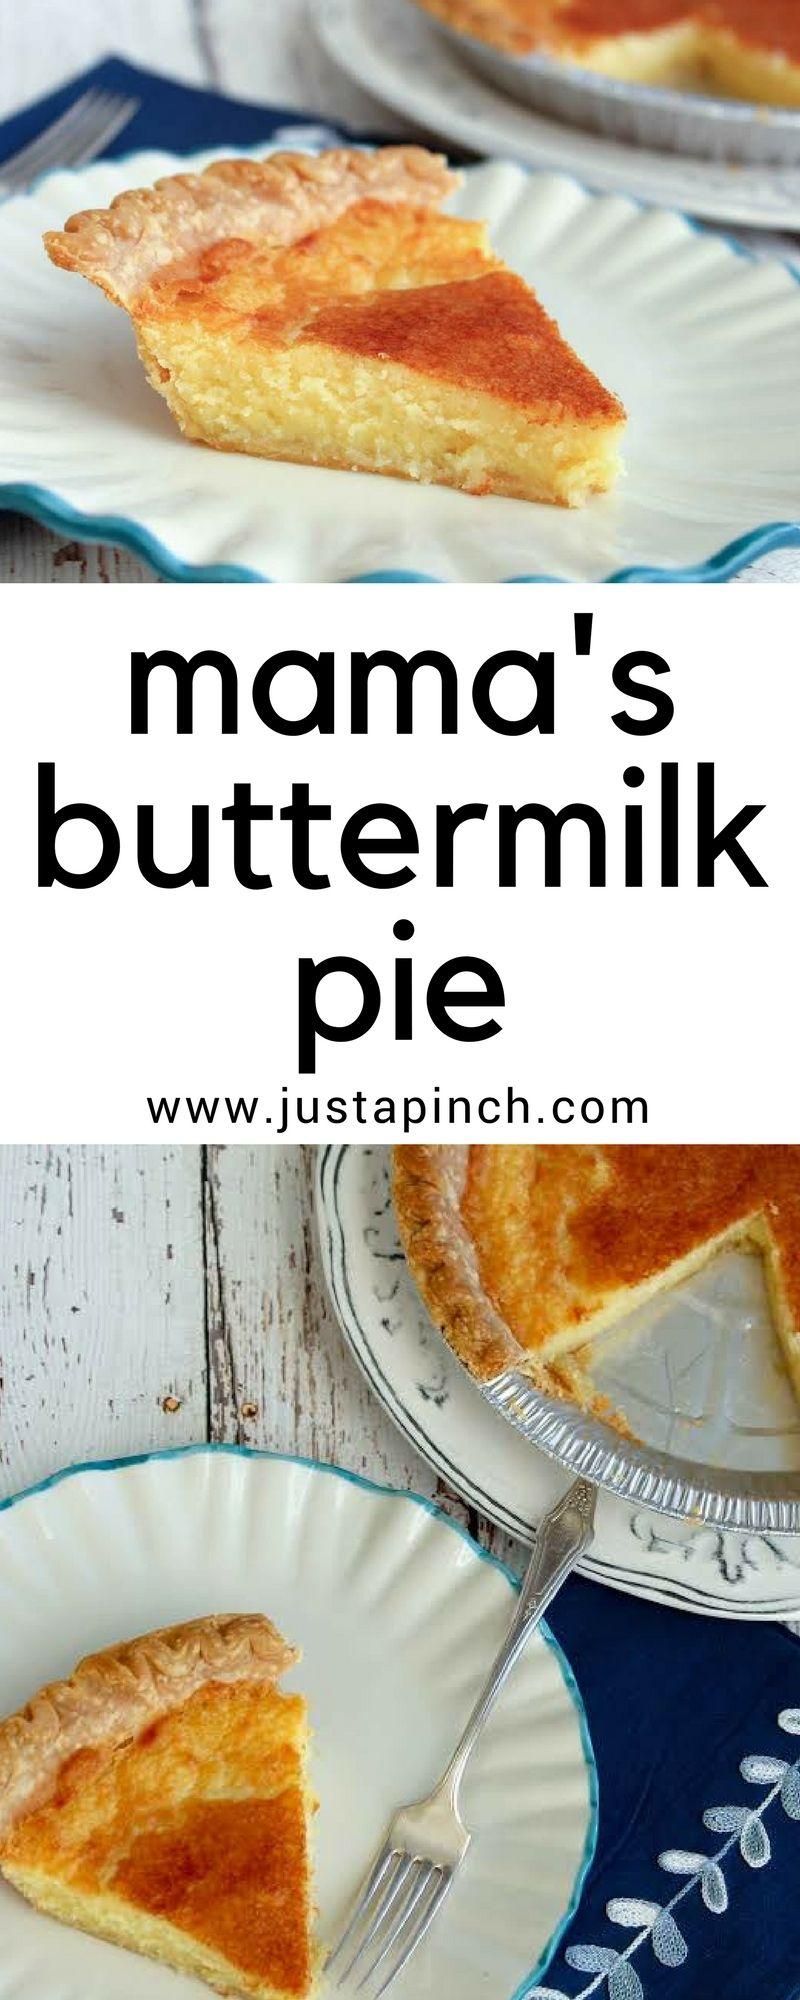 Mama S Buttermilk Pie Recipe Buttermilk Pie Buttermilk Recipes Buttermilk Pie Recipe